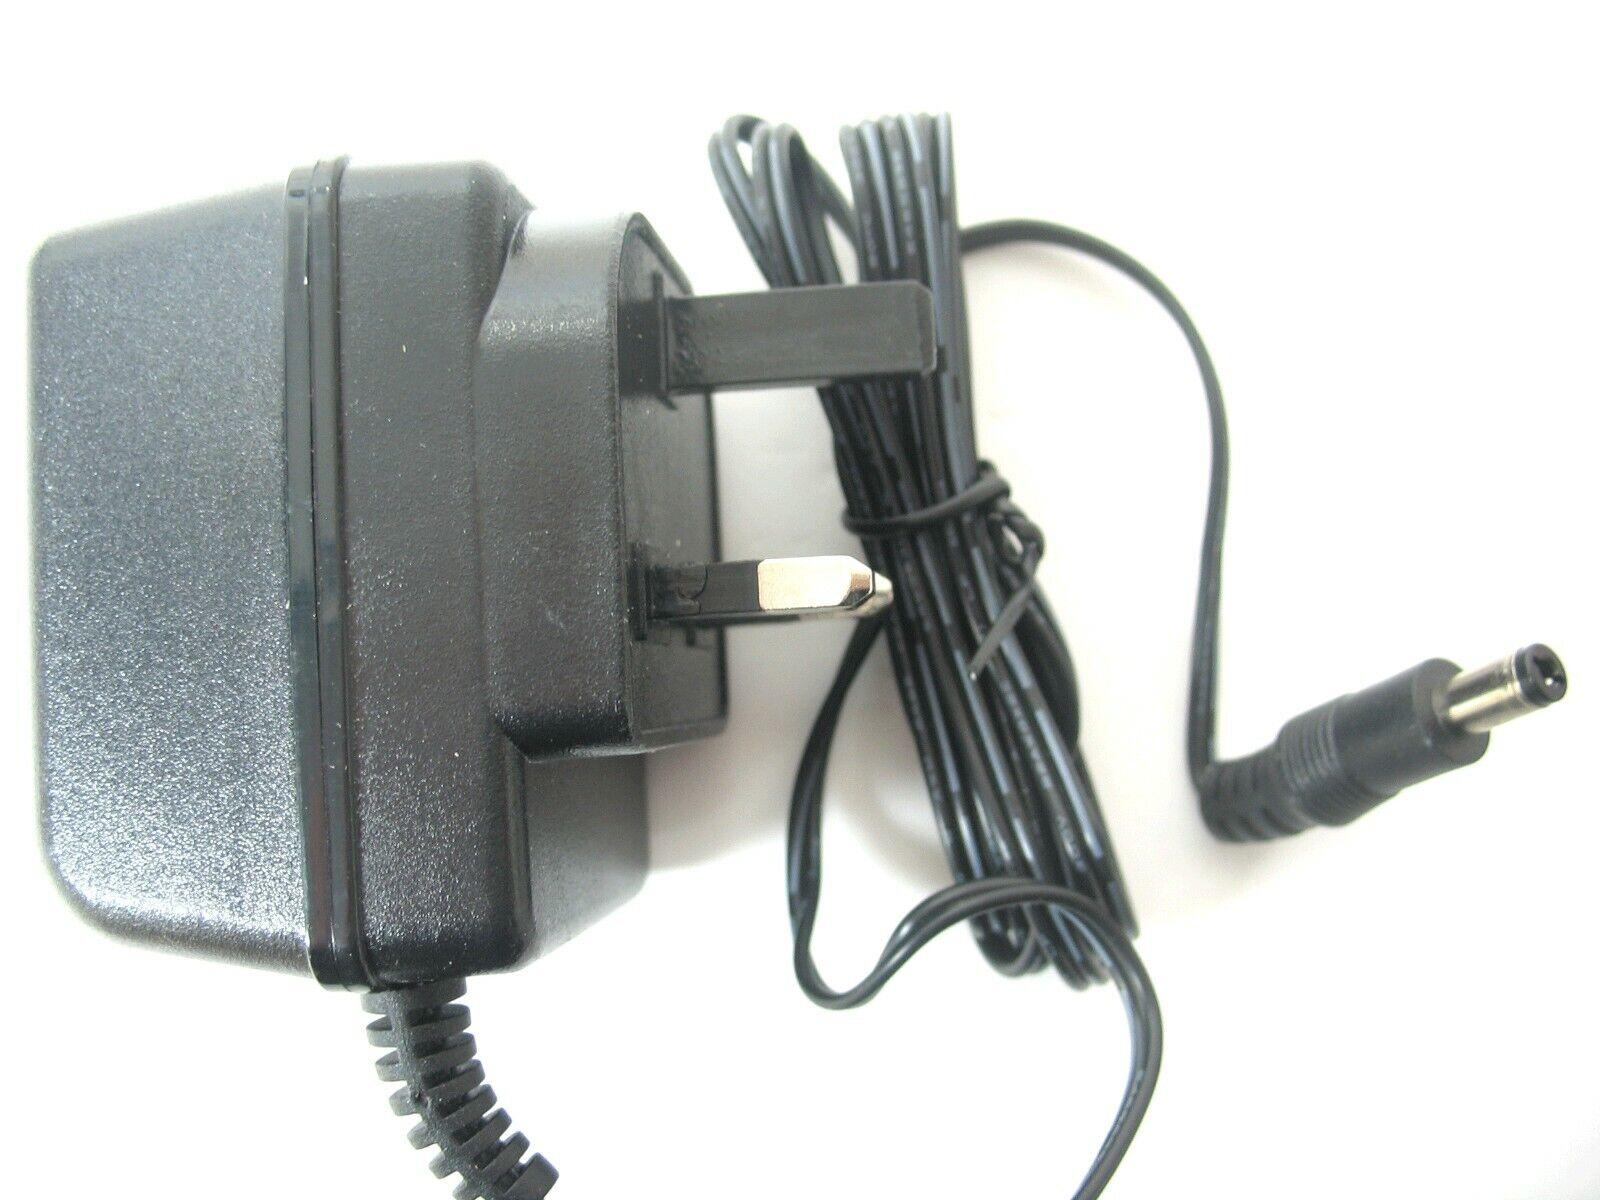 0.5 amp 24 volt AC-AC (AC Output) Mains Power Adaptor/Supply/Charger (12 watt)